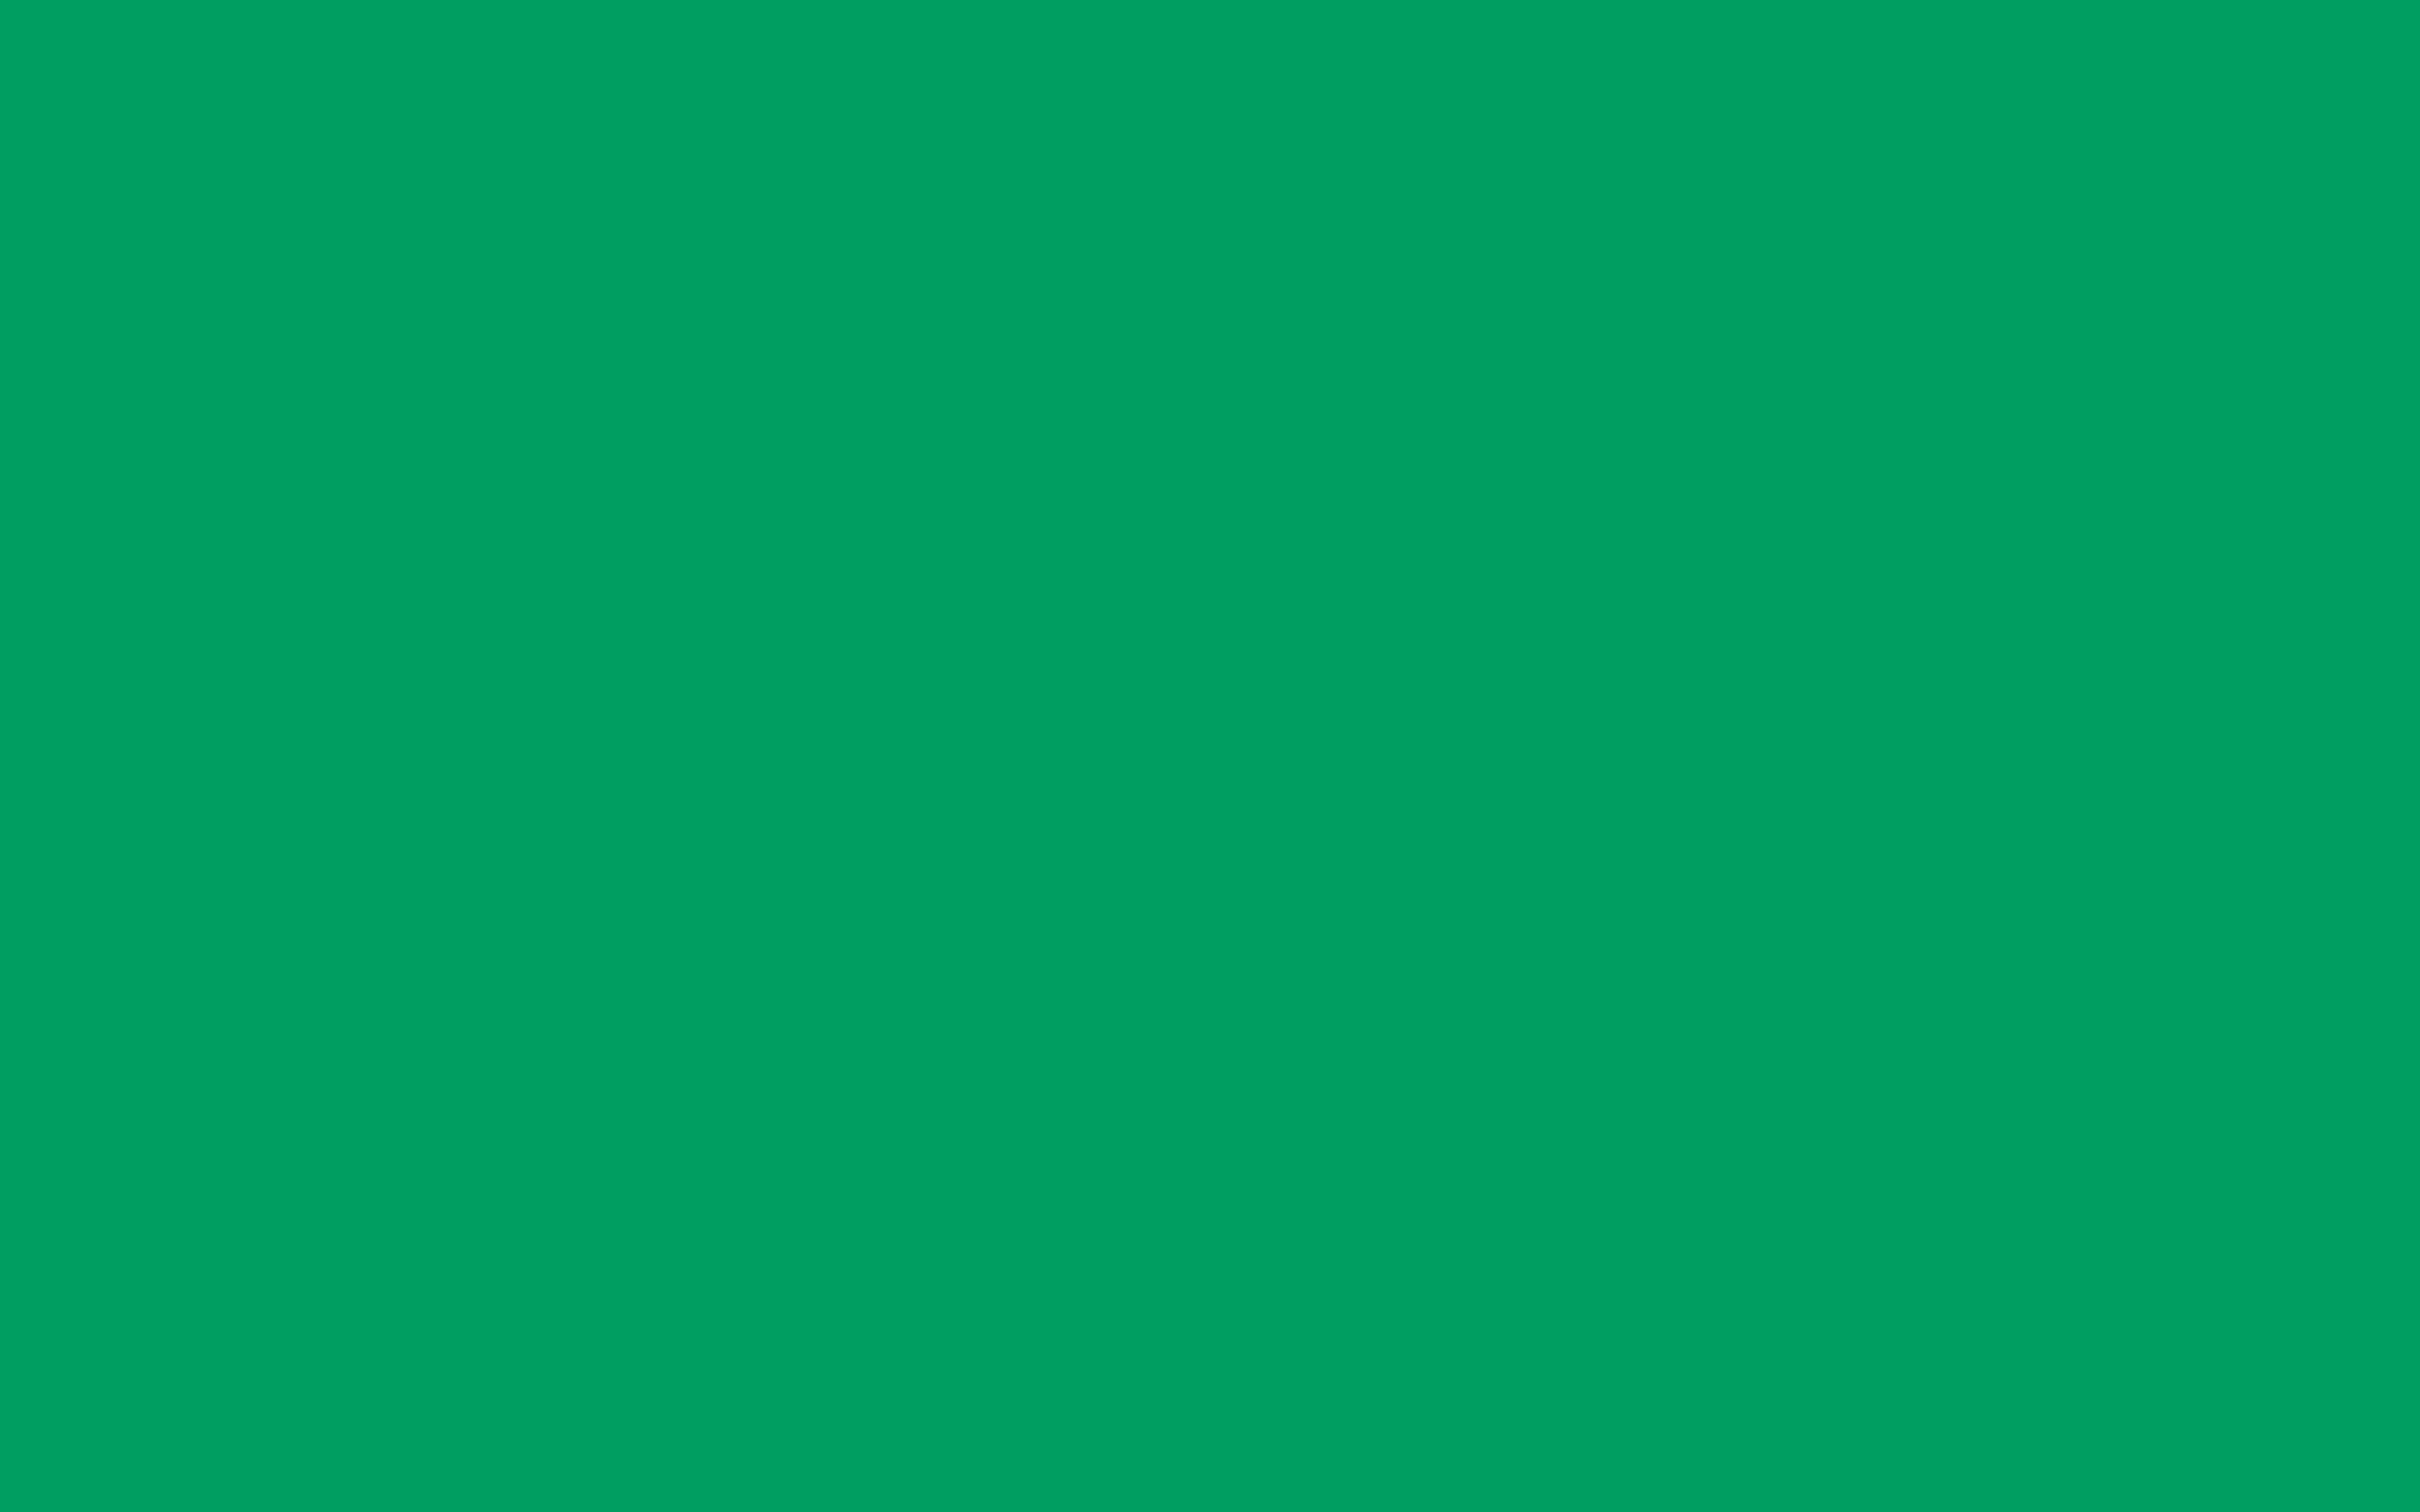 2560x1600 Shamrock Green Solid Color Background